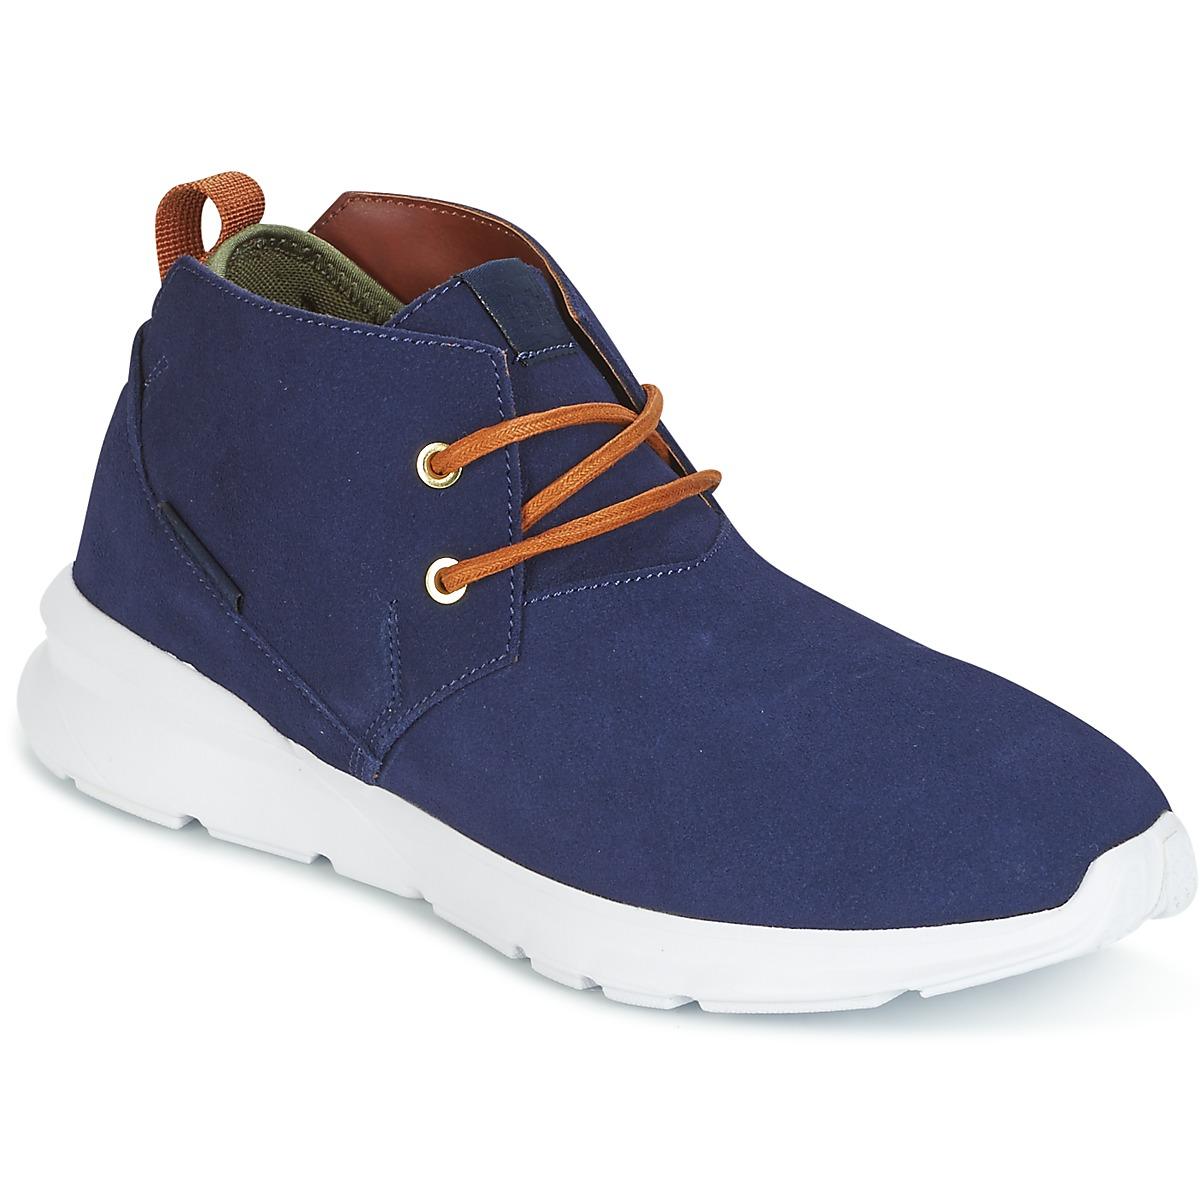 Støvler DC Shoes  ASHLAR M SHOE NC2